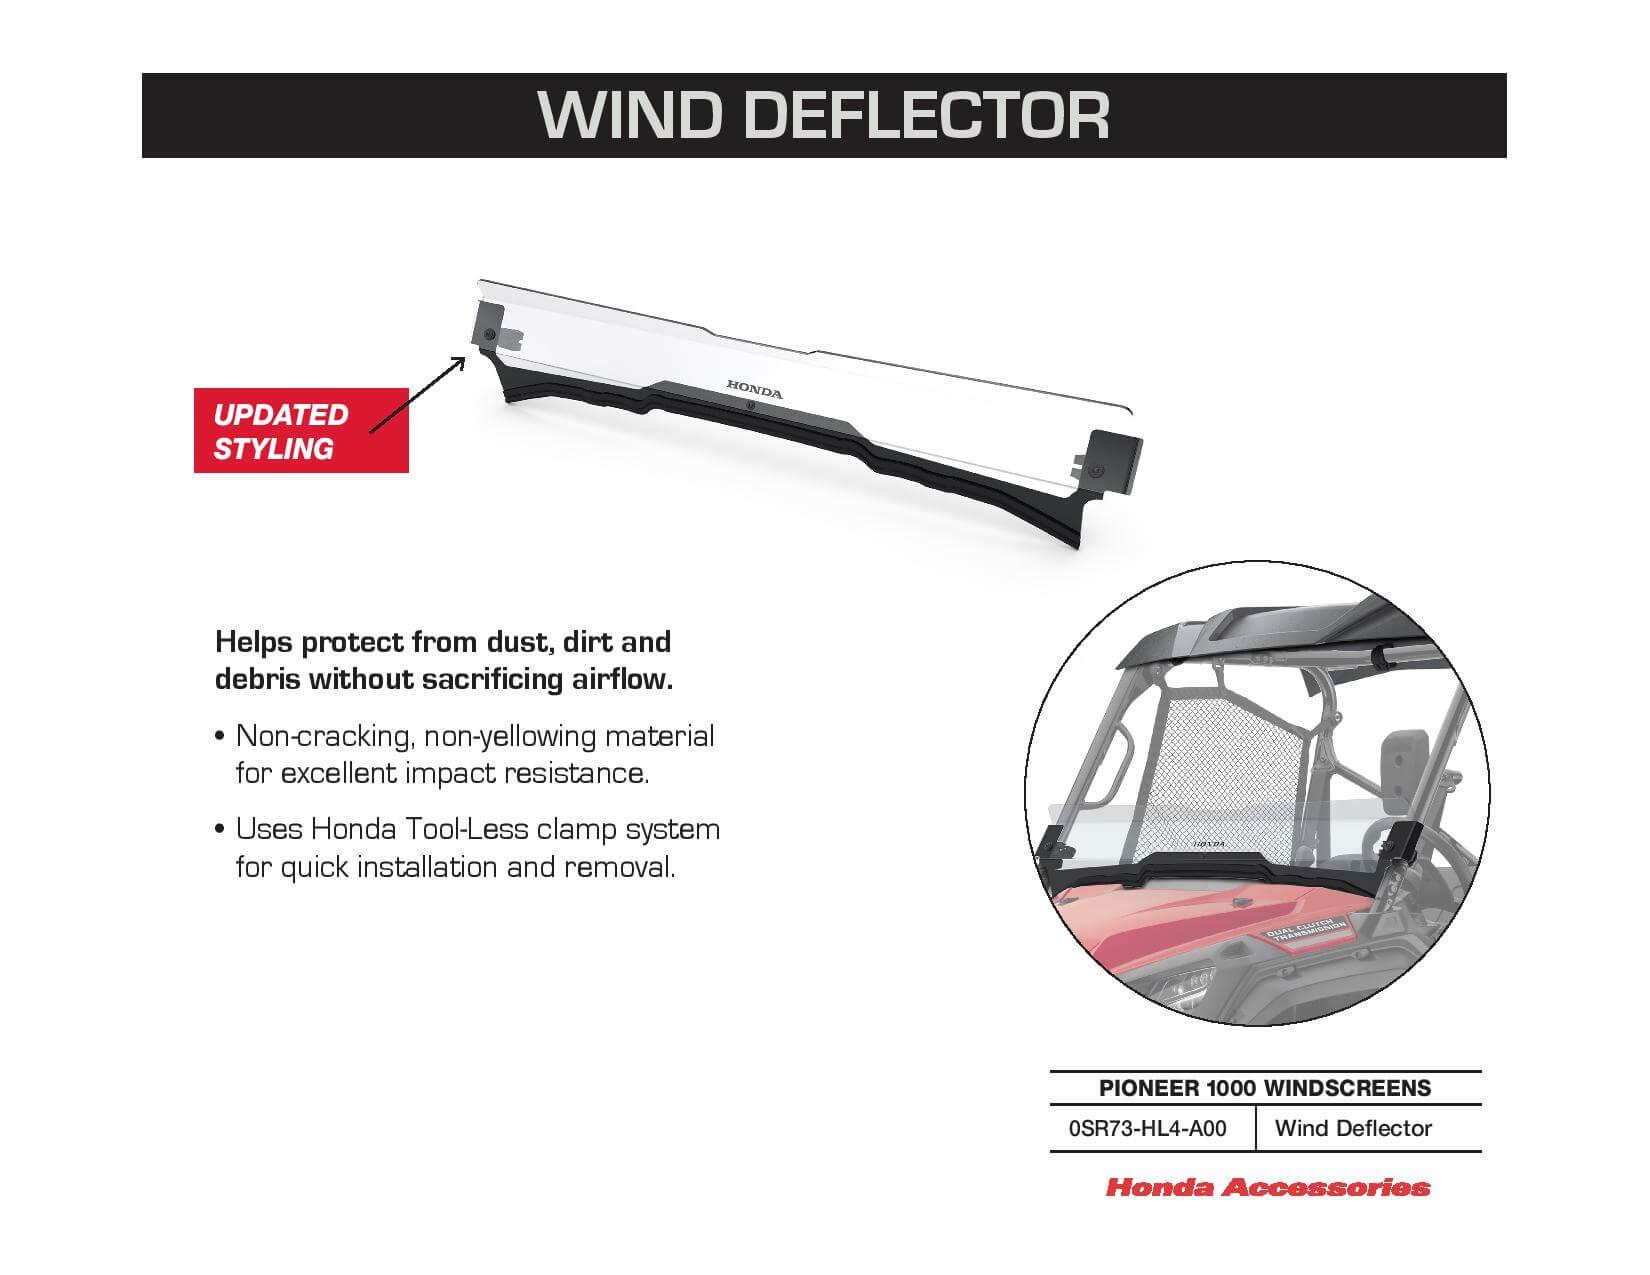 Honda Pioneer 1000 Wind Deflector | 0SR73-HL4-A00